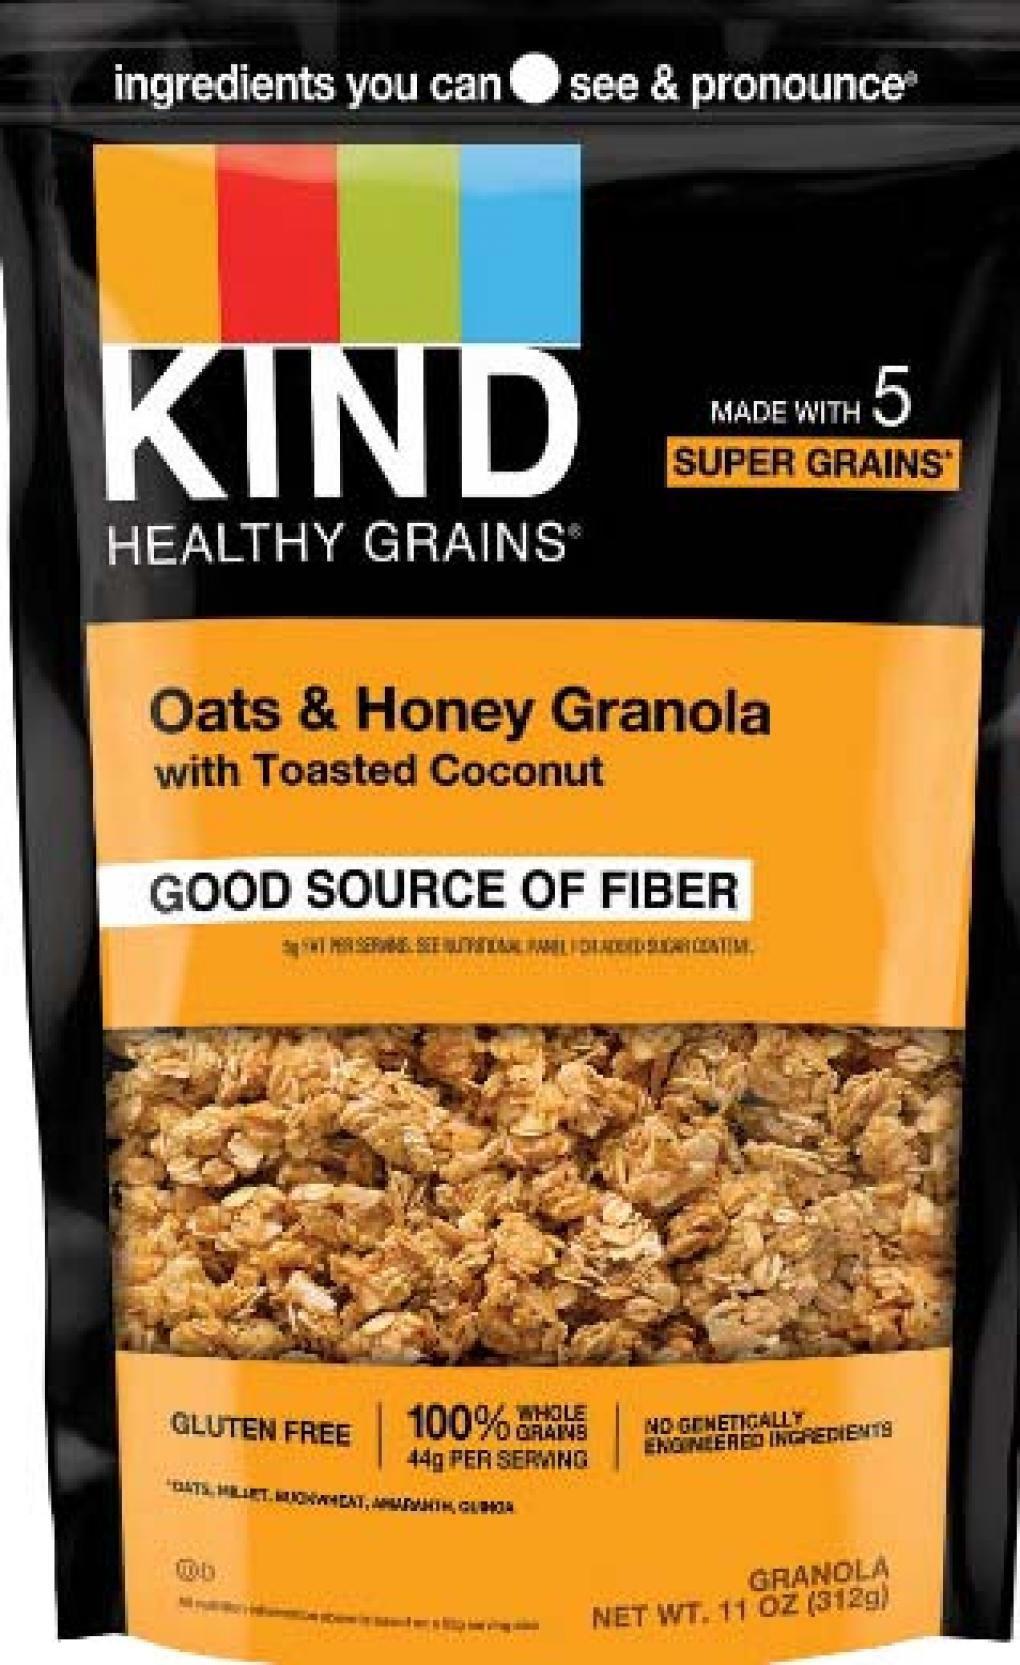 Recall granola